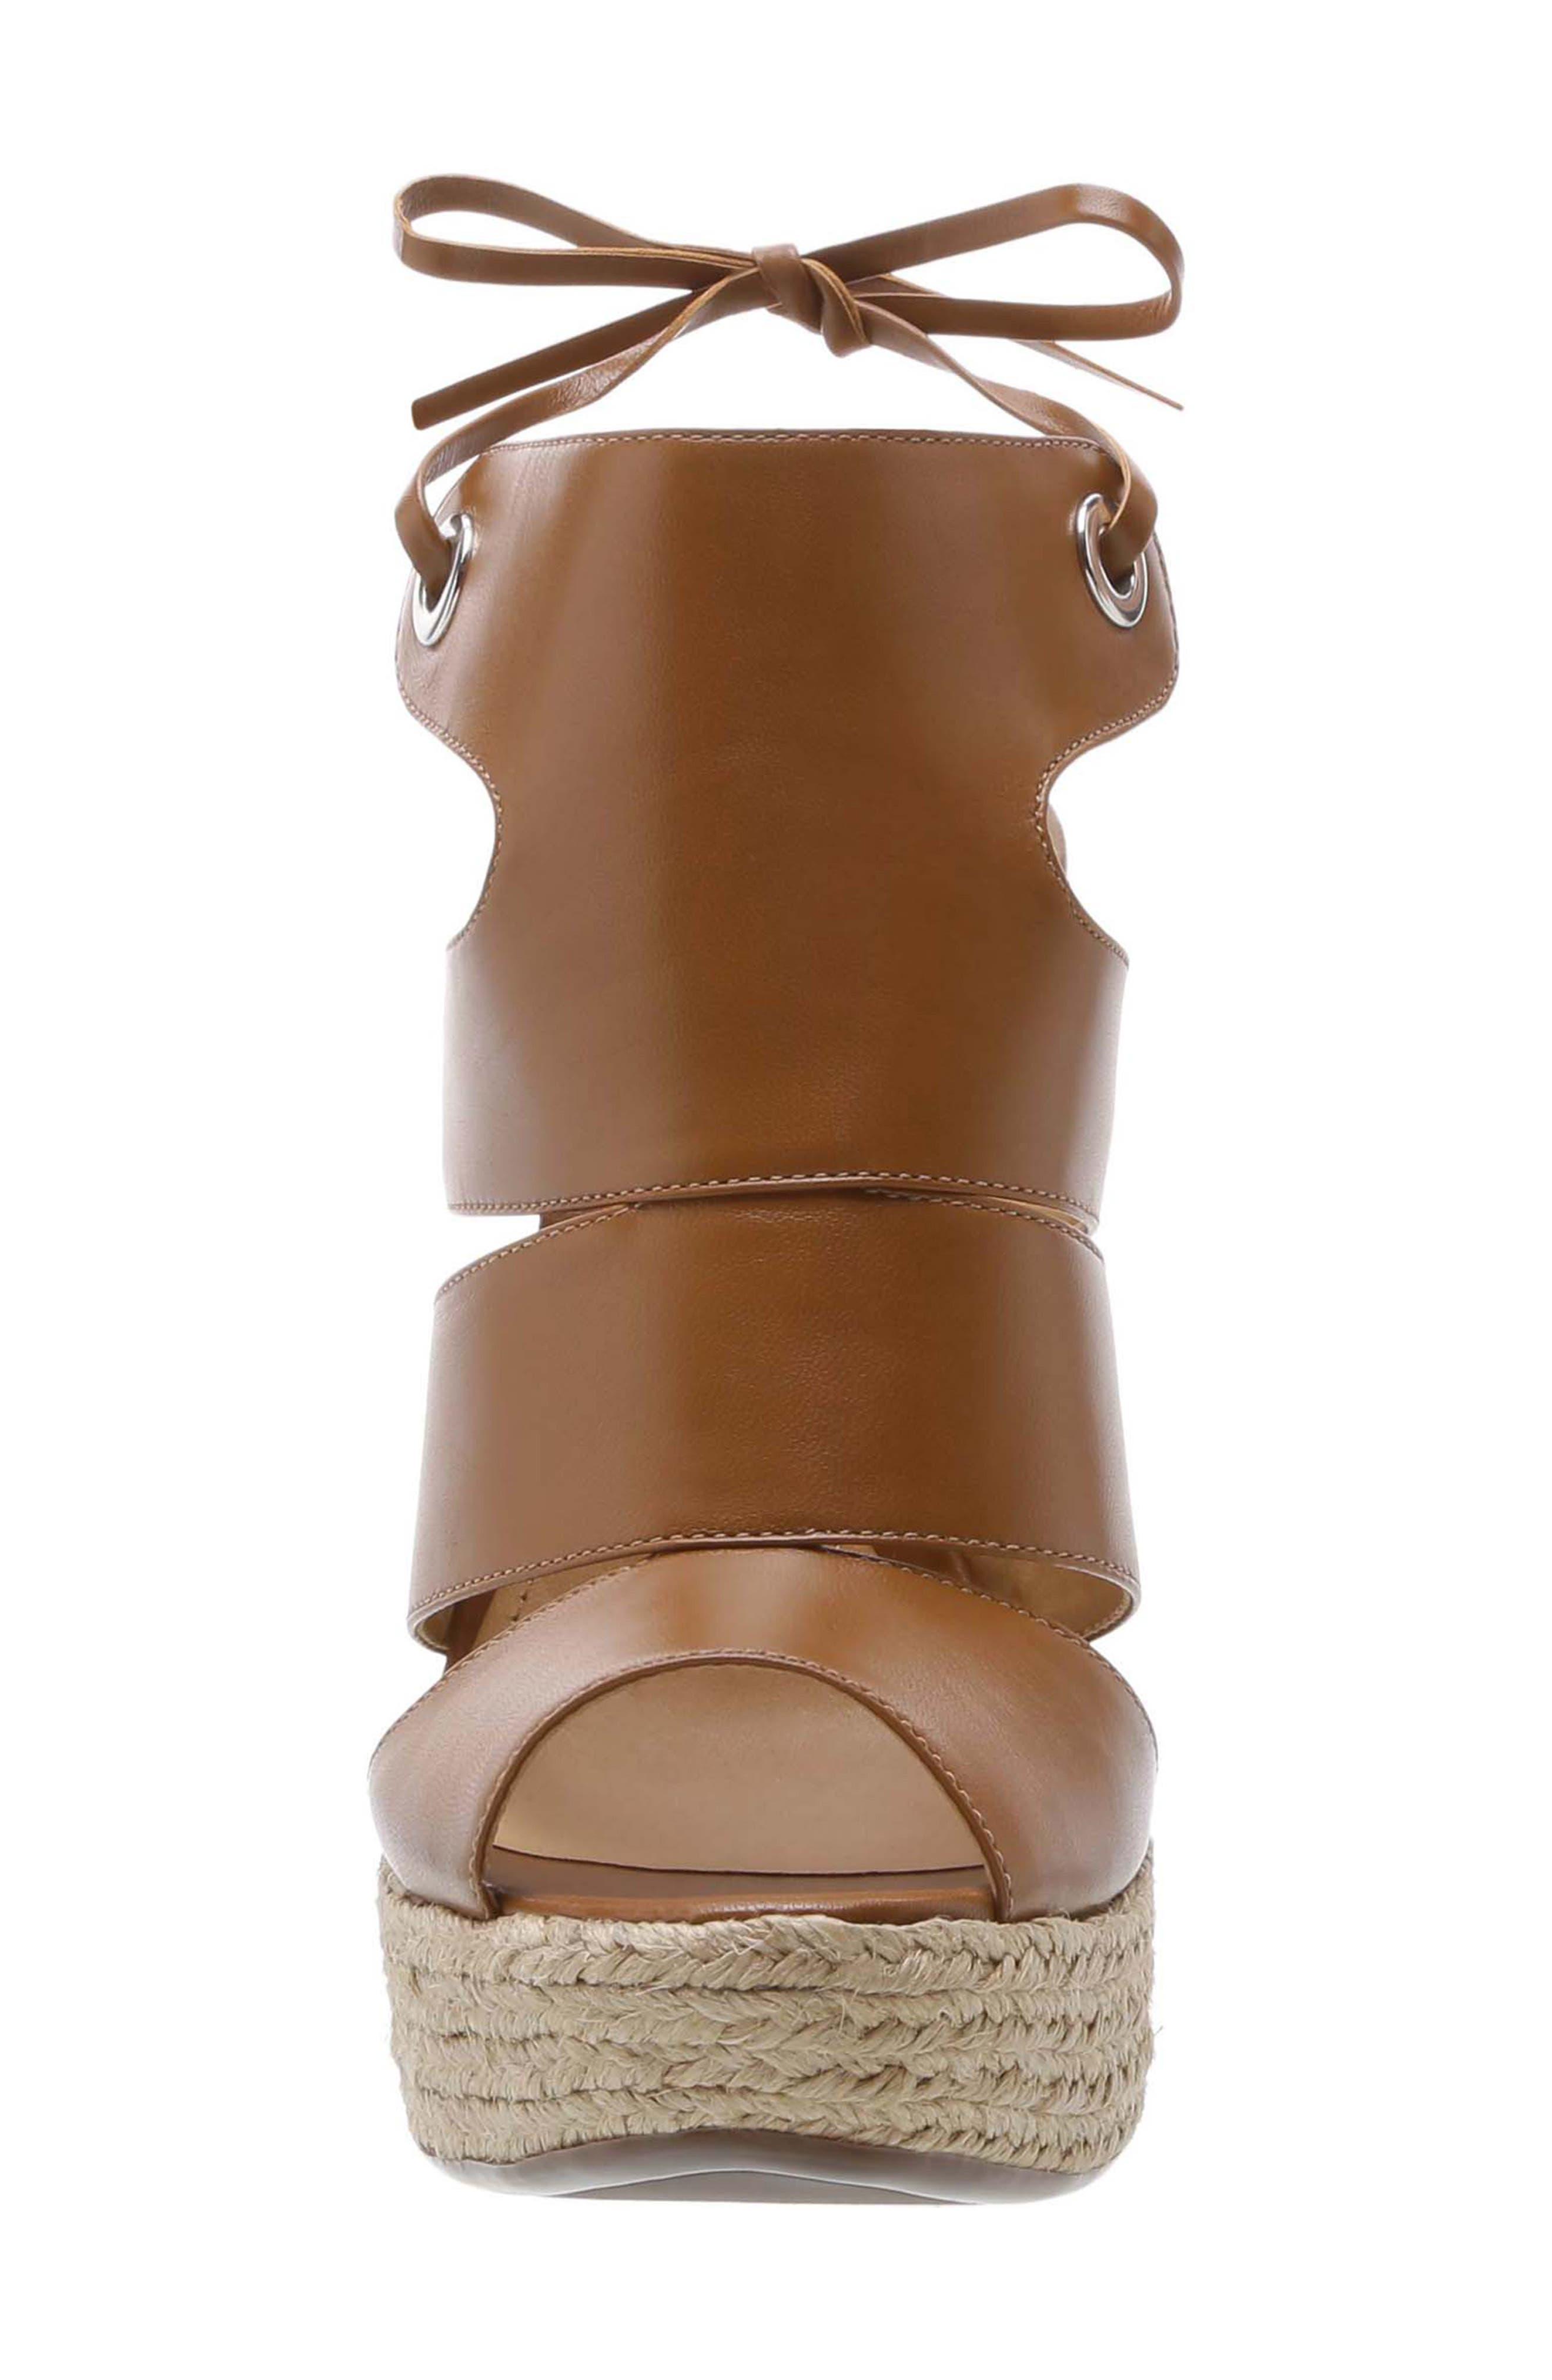 Ilione Platform Wedge Sandal,                             Alternate thumbnail 4, color,                             WOOD LEATHER